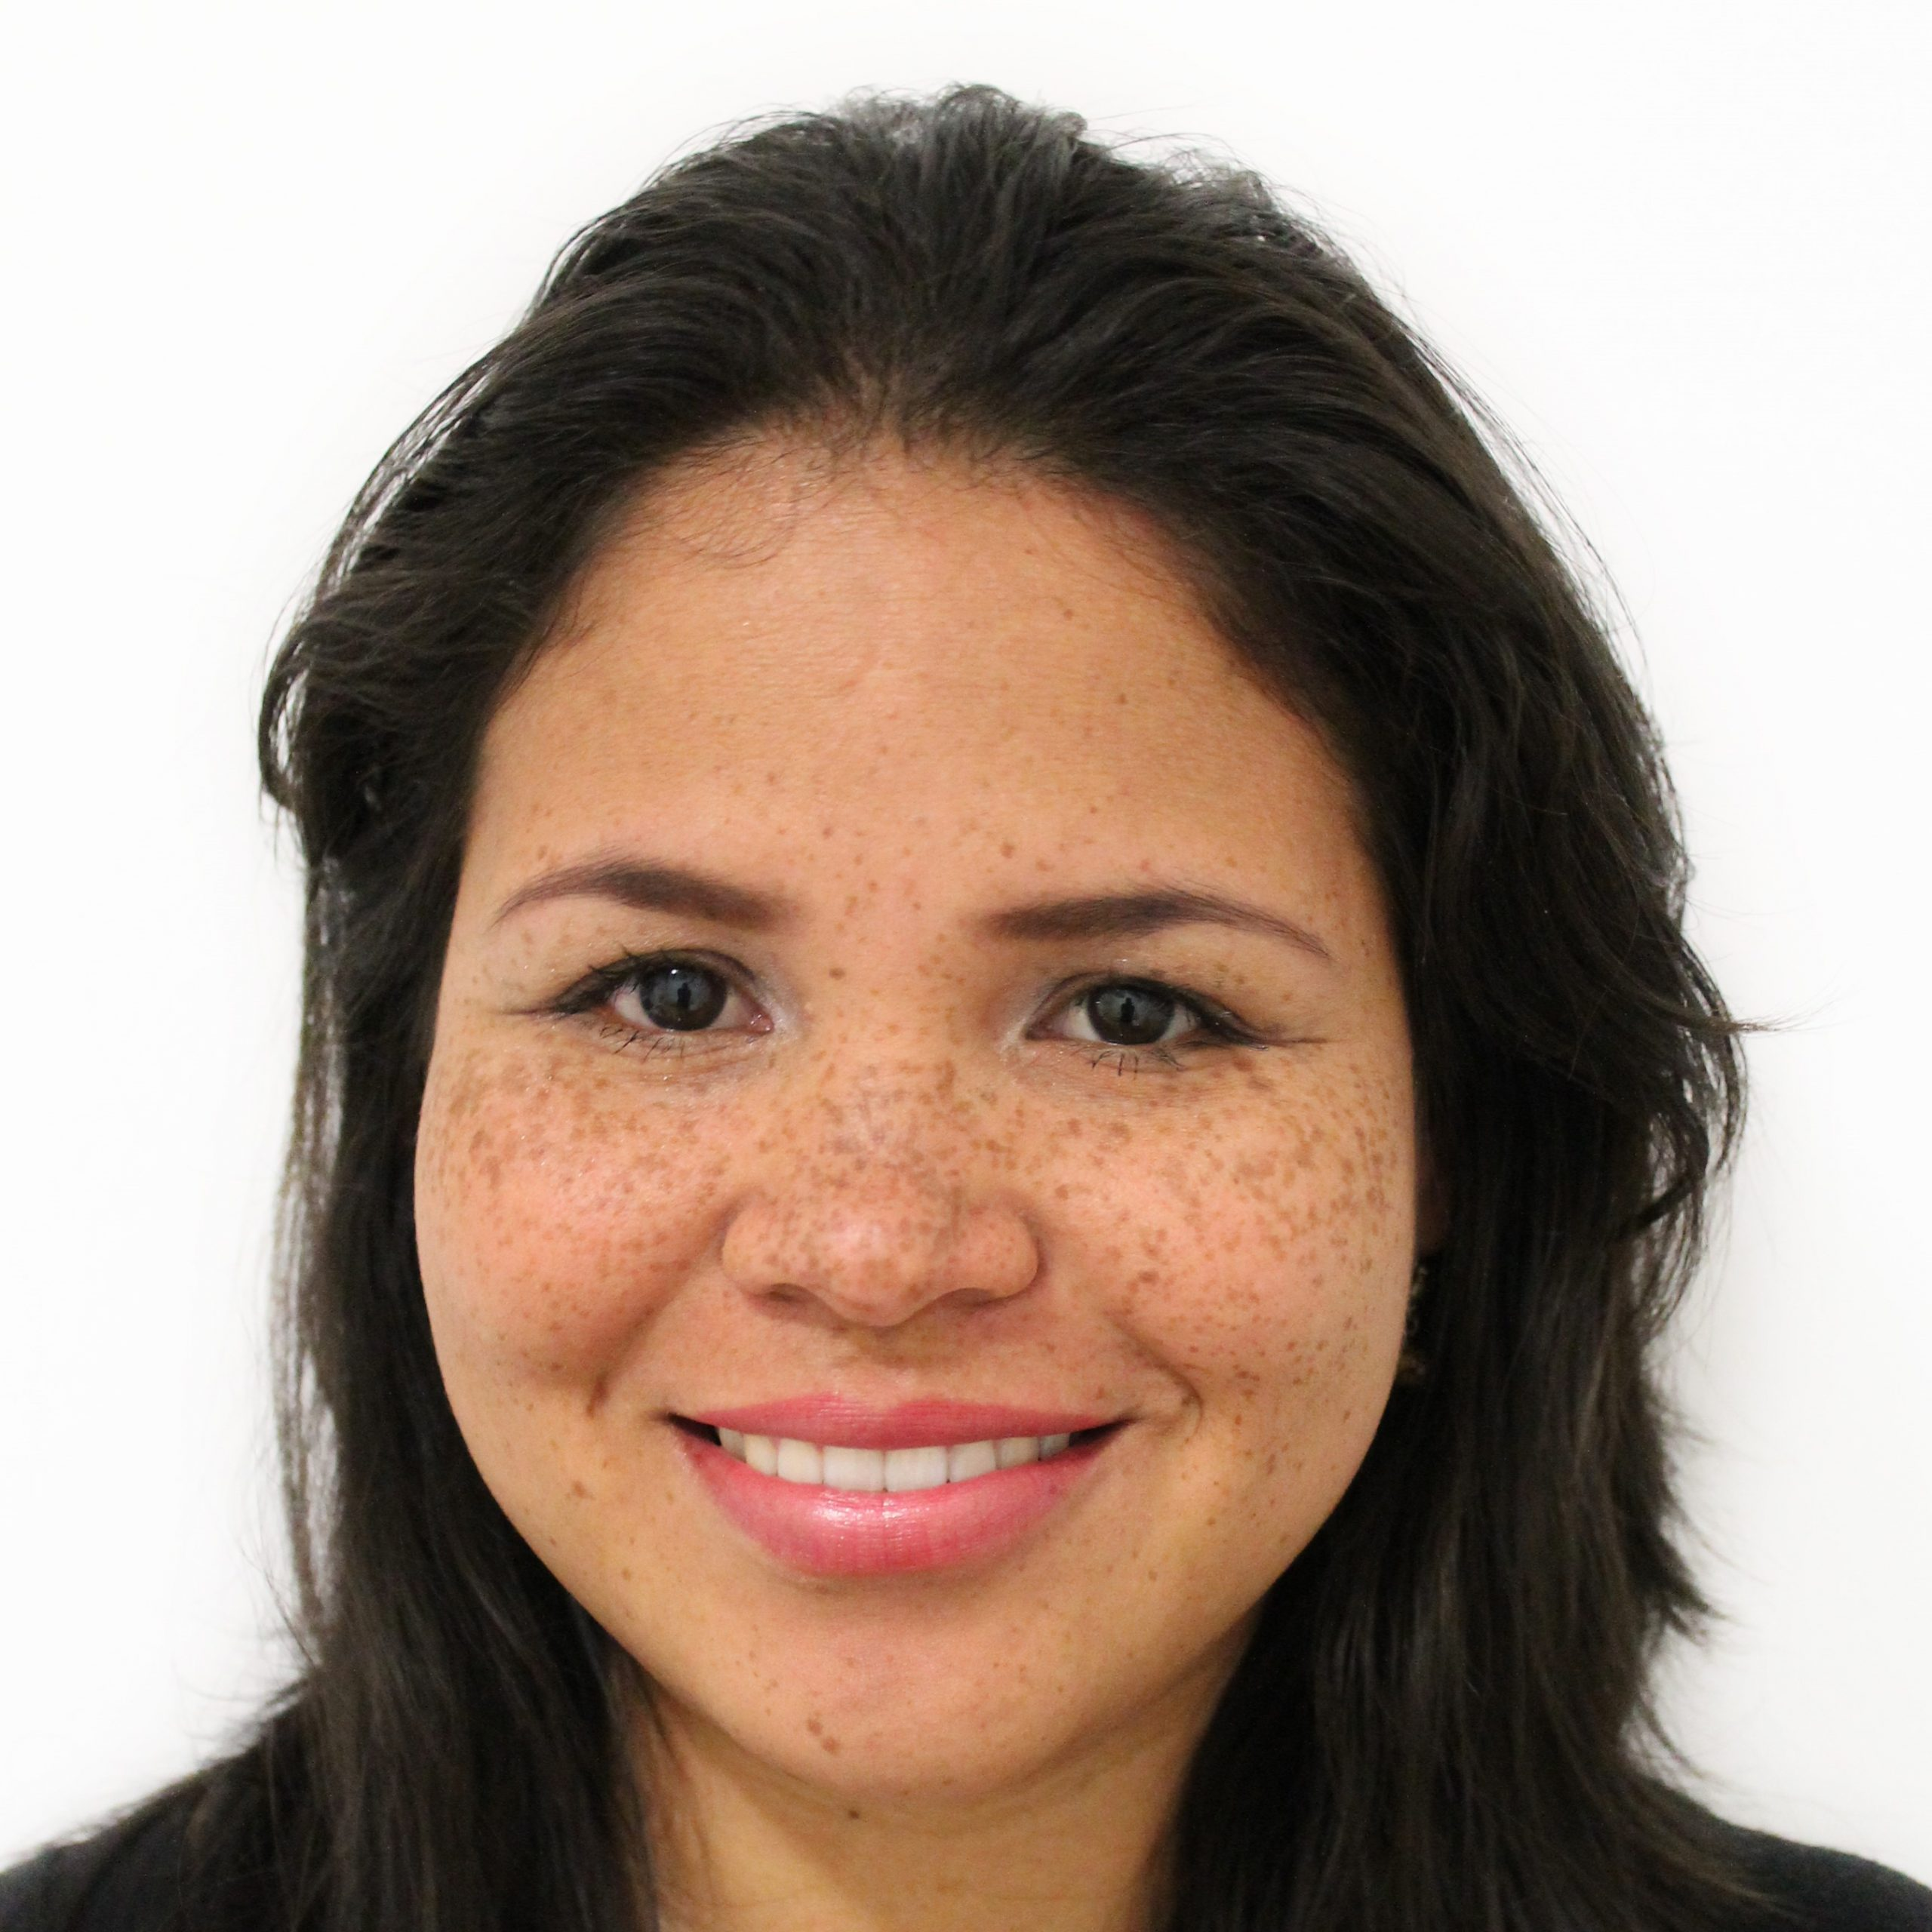 Leidy Y. Serna Higuita